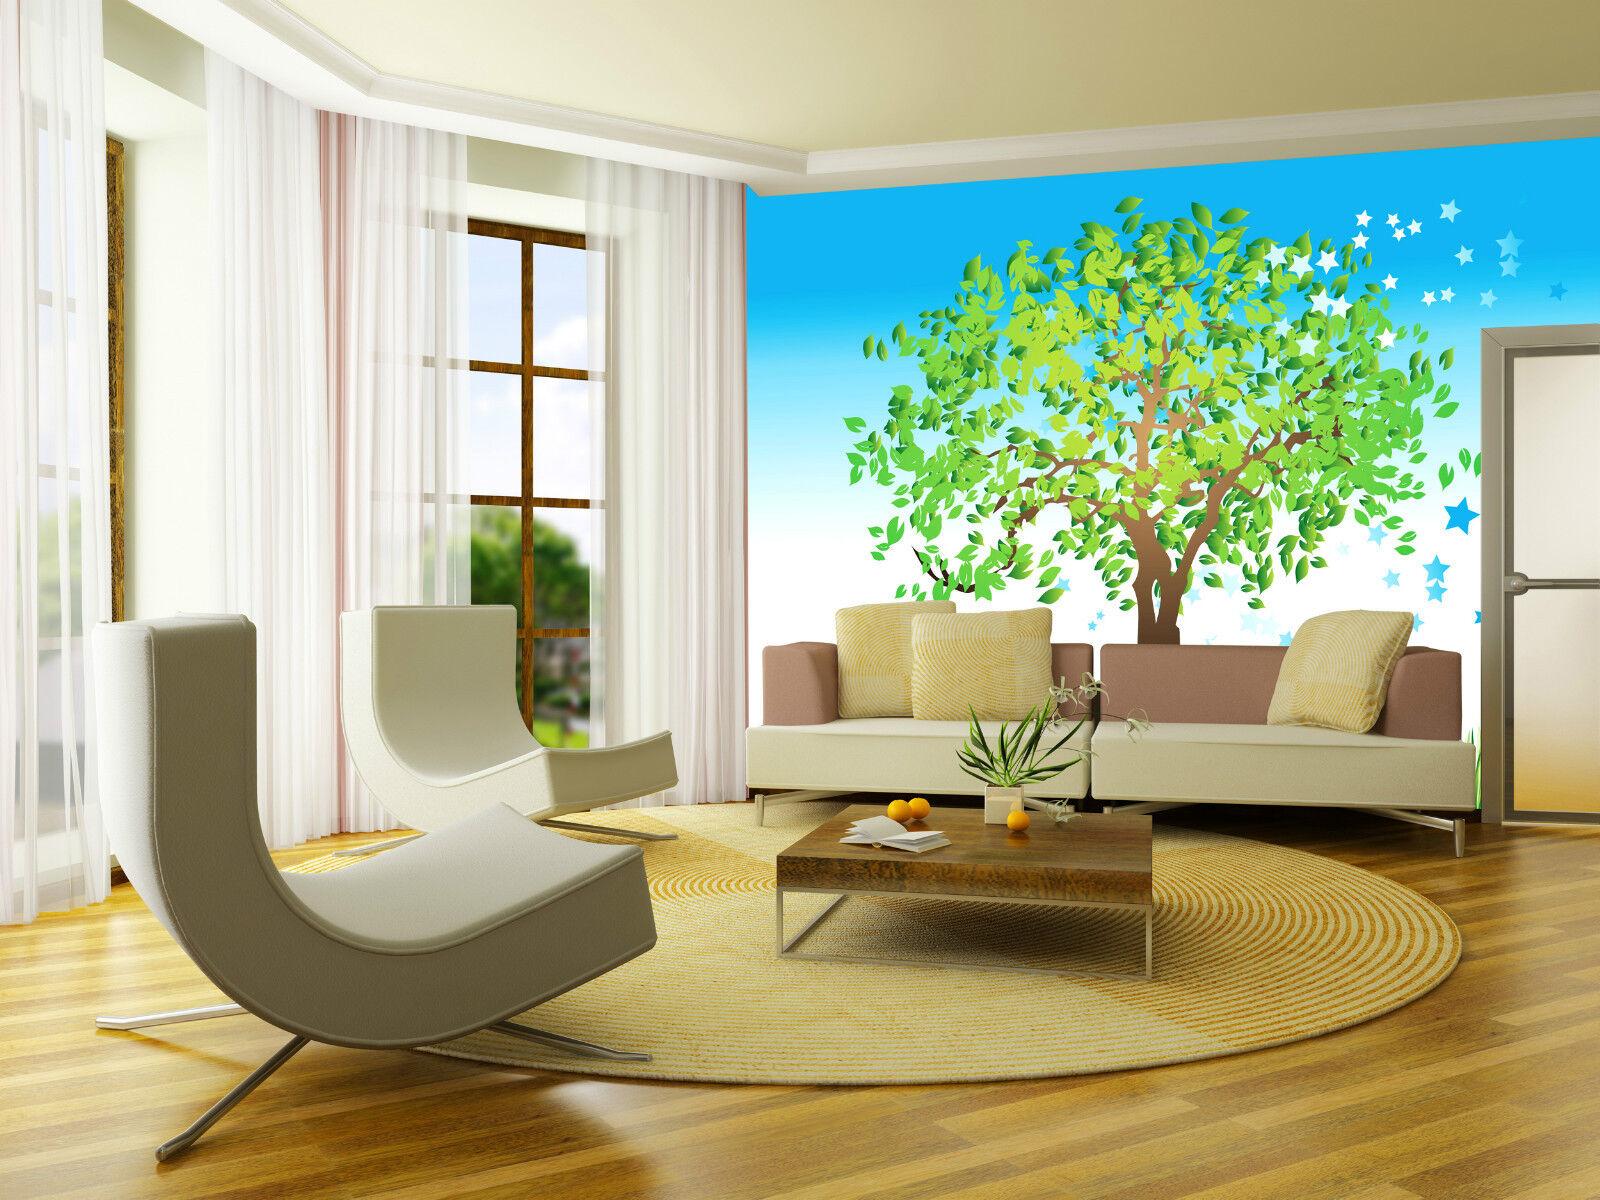 3D Grün grass trees 1B WallPaper Murals Wall Print Decal Wall Deco AJ WALLPAPER